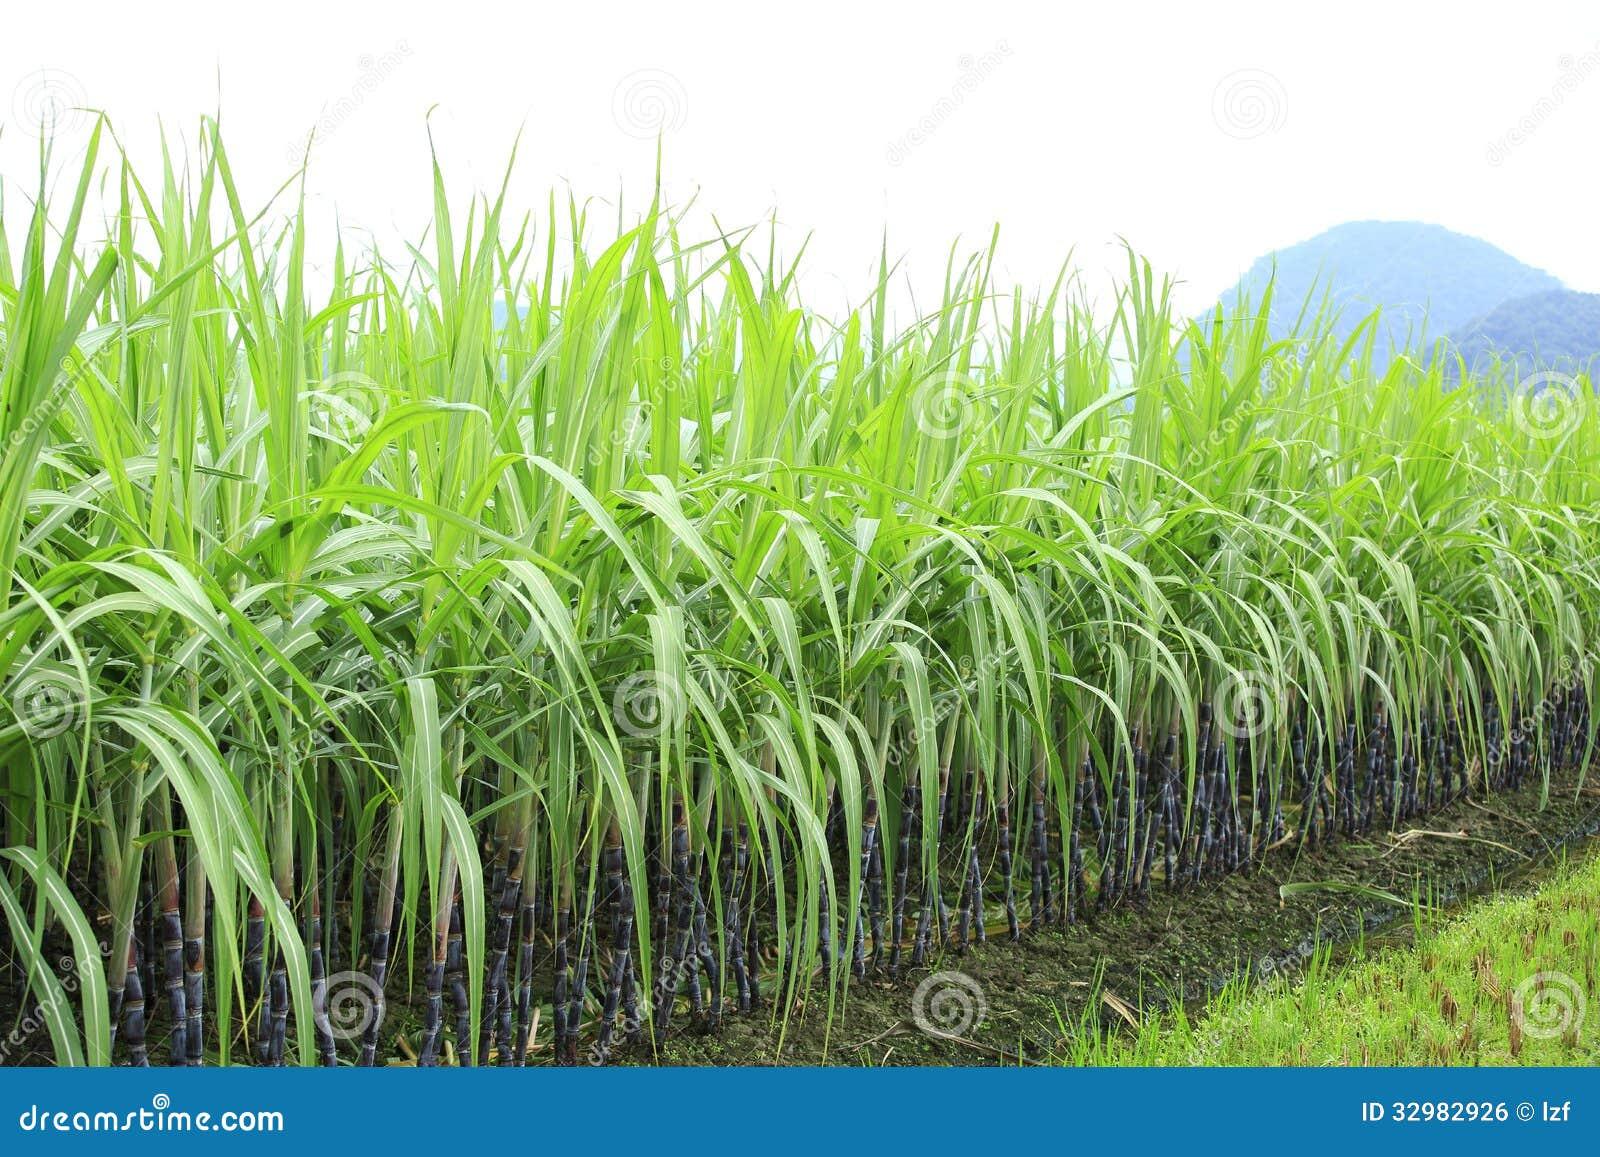 Sugarcane At Field Royalty Free Stock Image